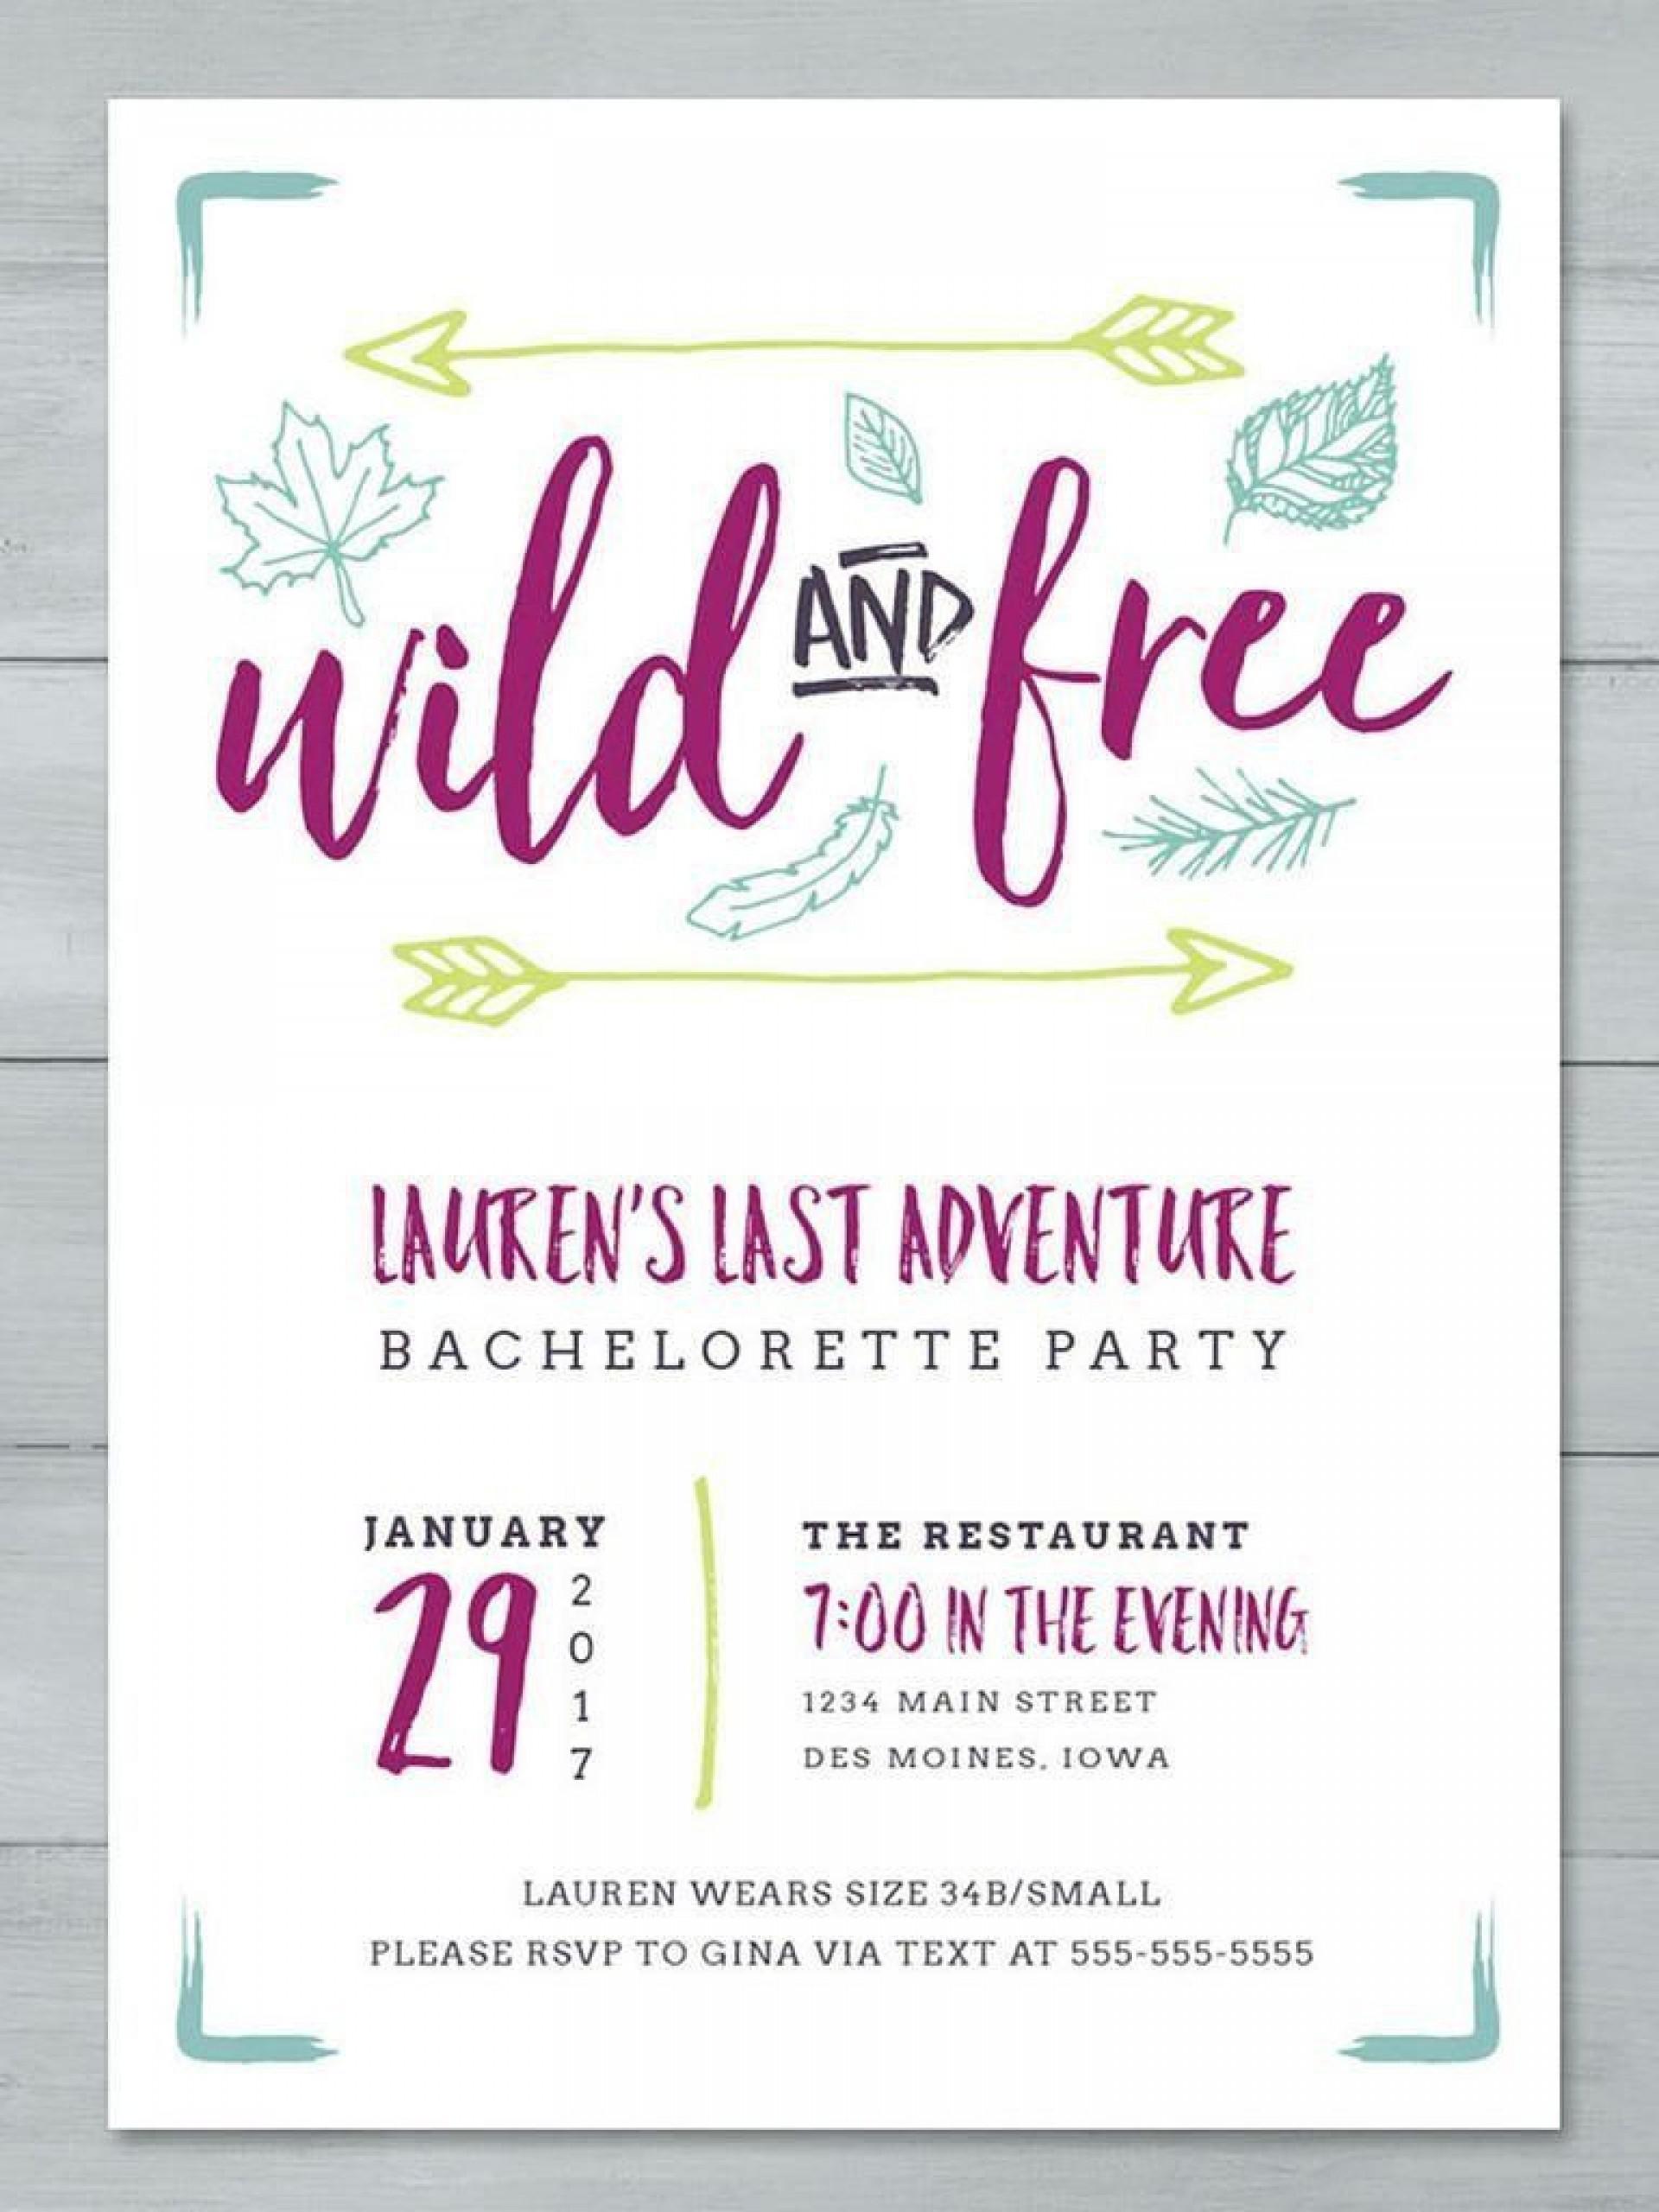 003 Impressive Bachelorette Party Invitation Template Word Free High Def 1920